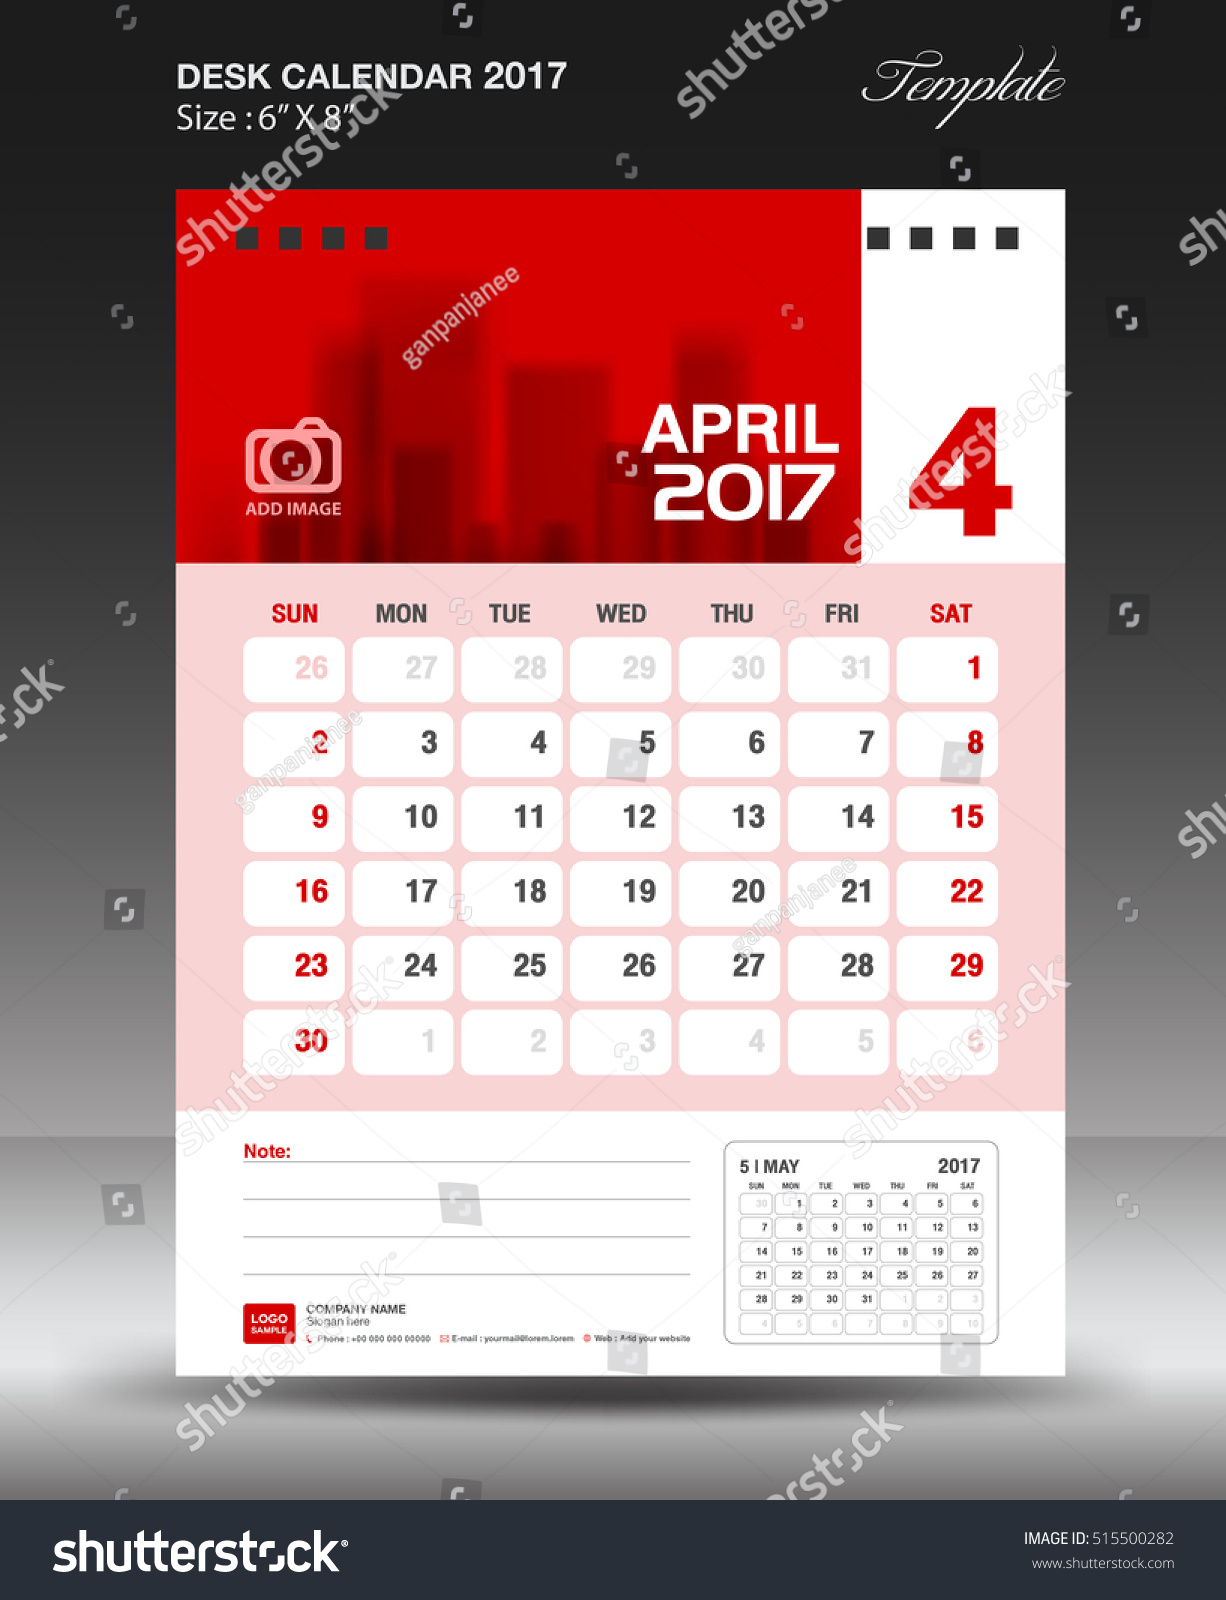 Corporate Calendar 2017 : April desk calendar year corporate stock vector